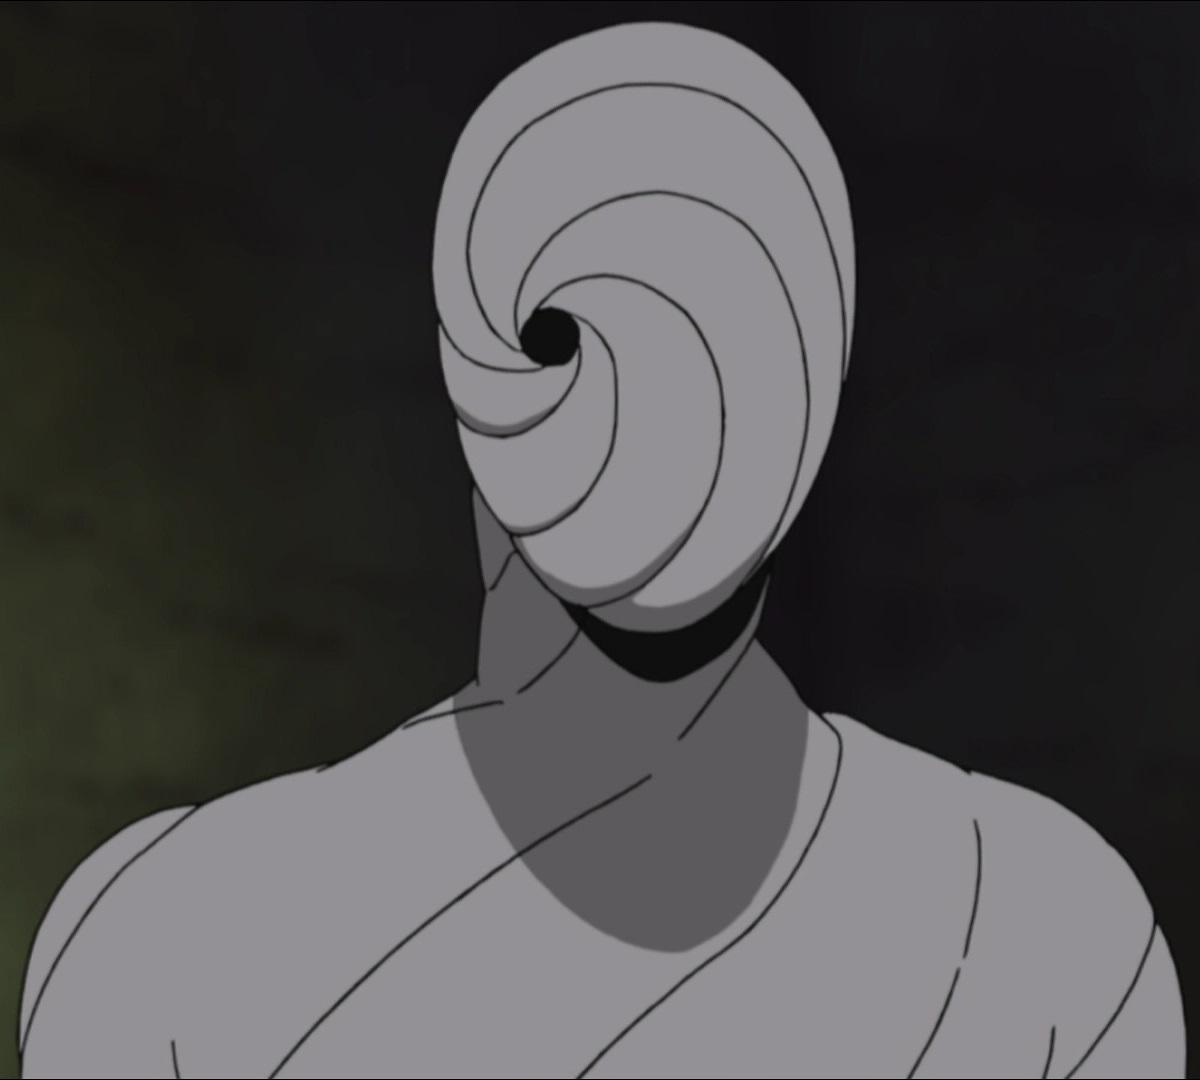 Tobi (Zetsu) | Naruto Wiki | Fandom powered by Wikia